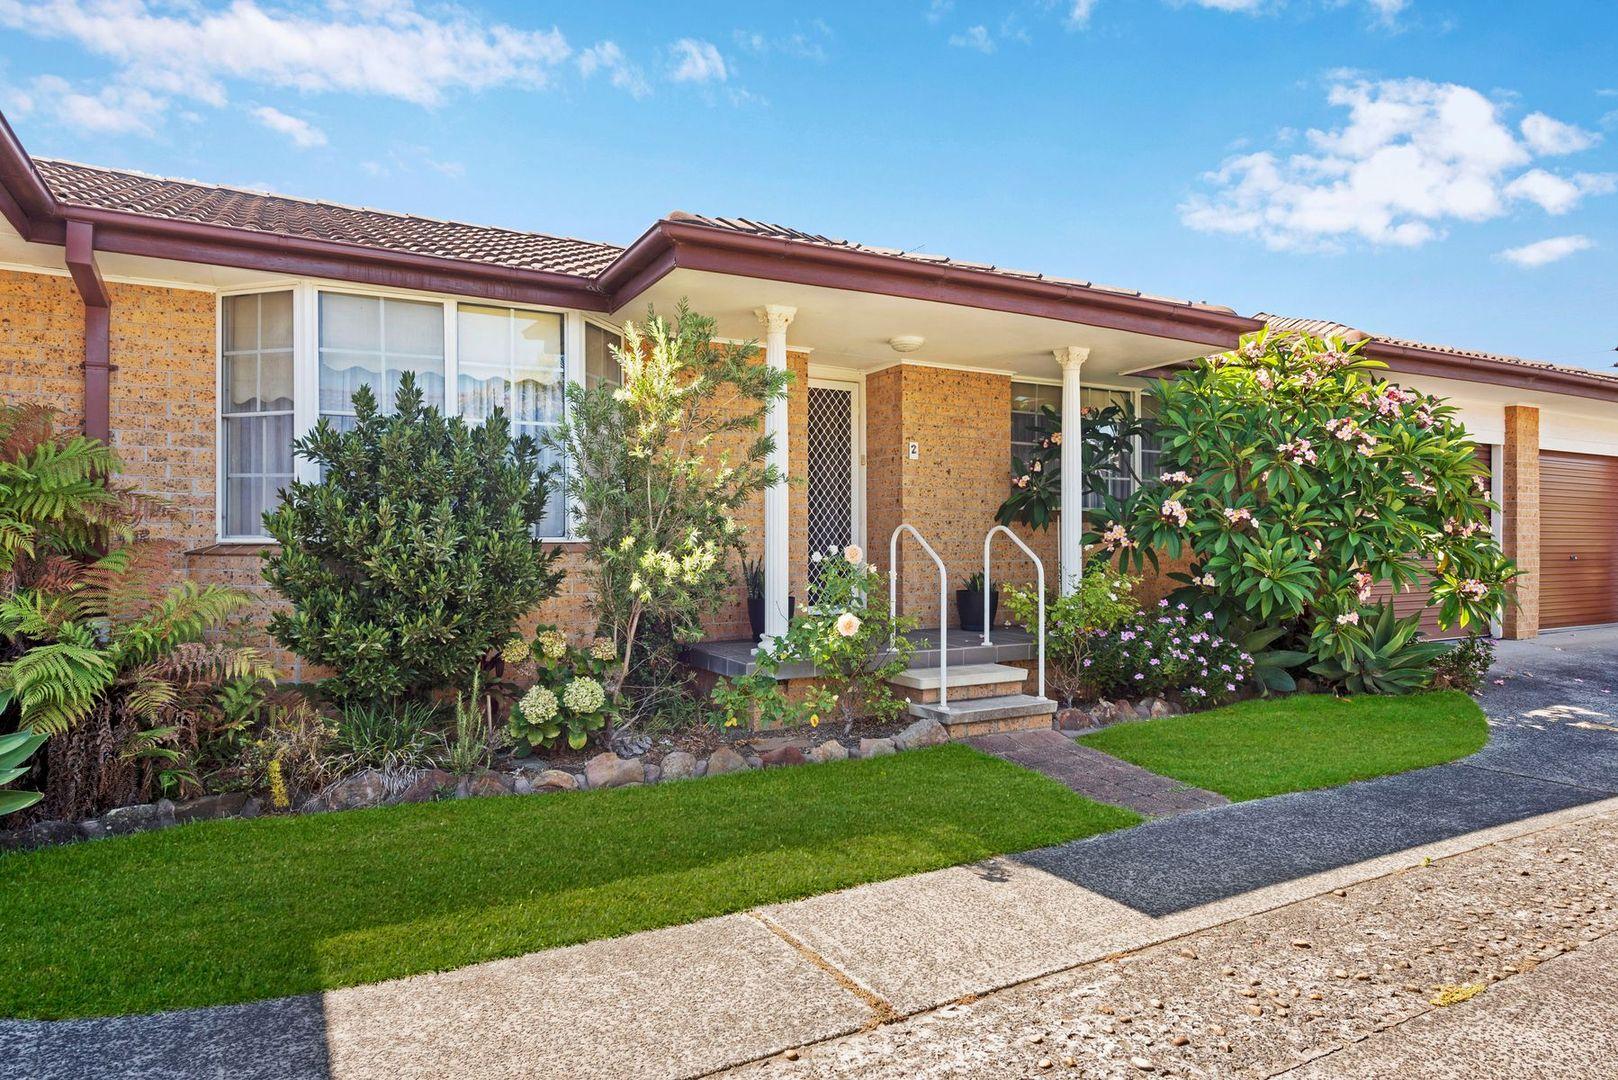 2/54-56 Swadling Street, Long Jetty NSW 2261, Image 1